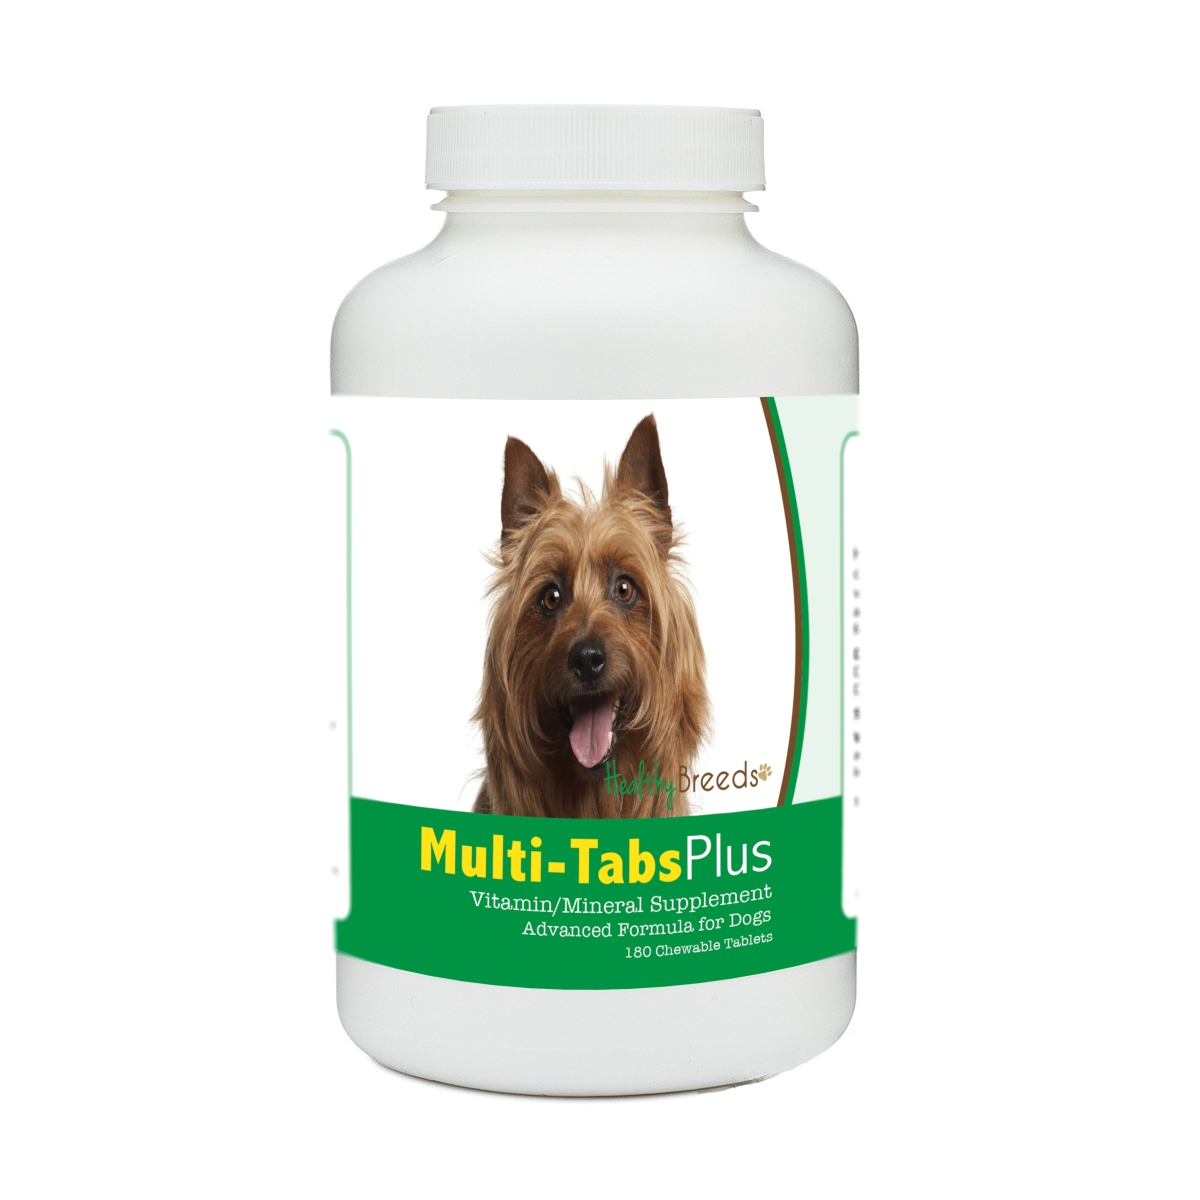 Healthy Breeds 840235178965 Australian Terrier Multi-Tabs Plus Chewable Tablets - 180 Count